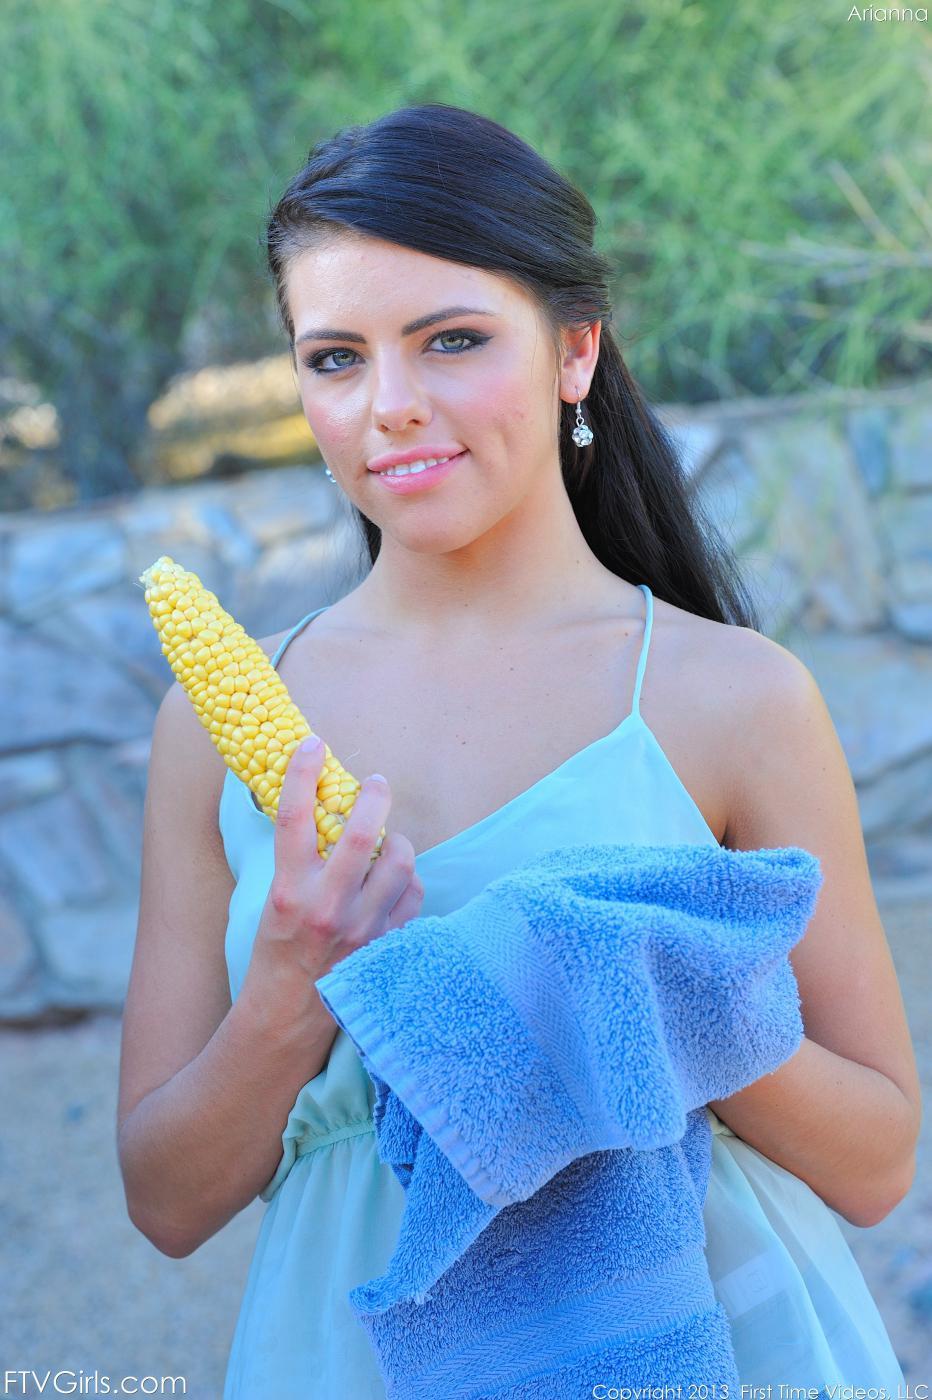 Негодная лесби Адриана Чечик желает, когда ее узкую писю ебут кулаком и кукурузой